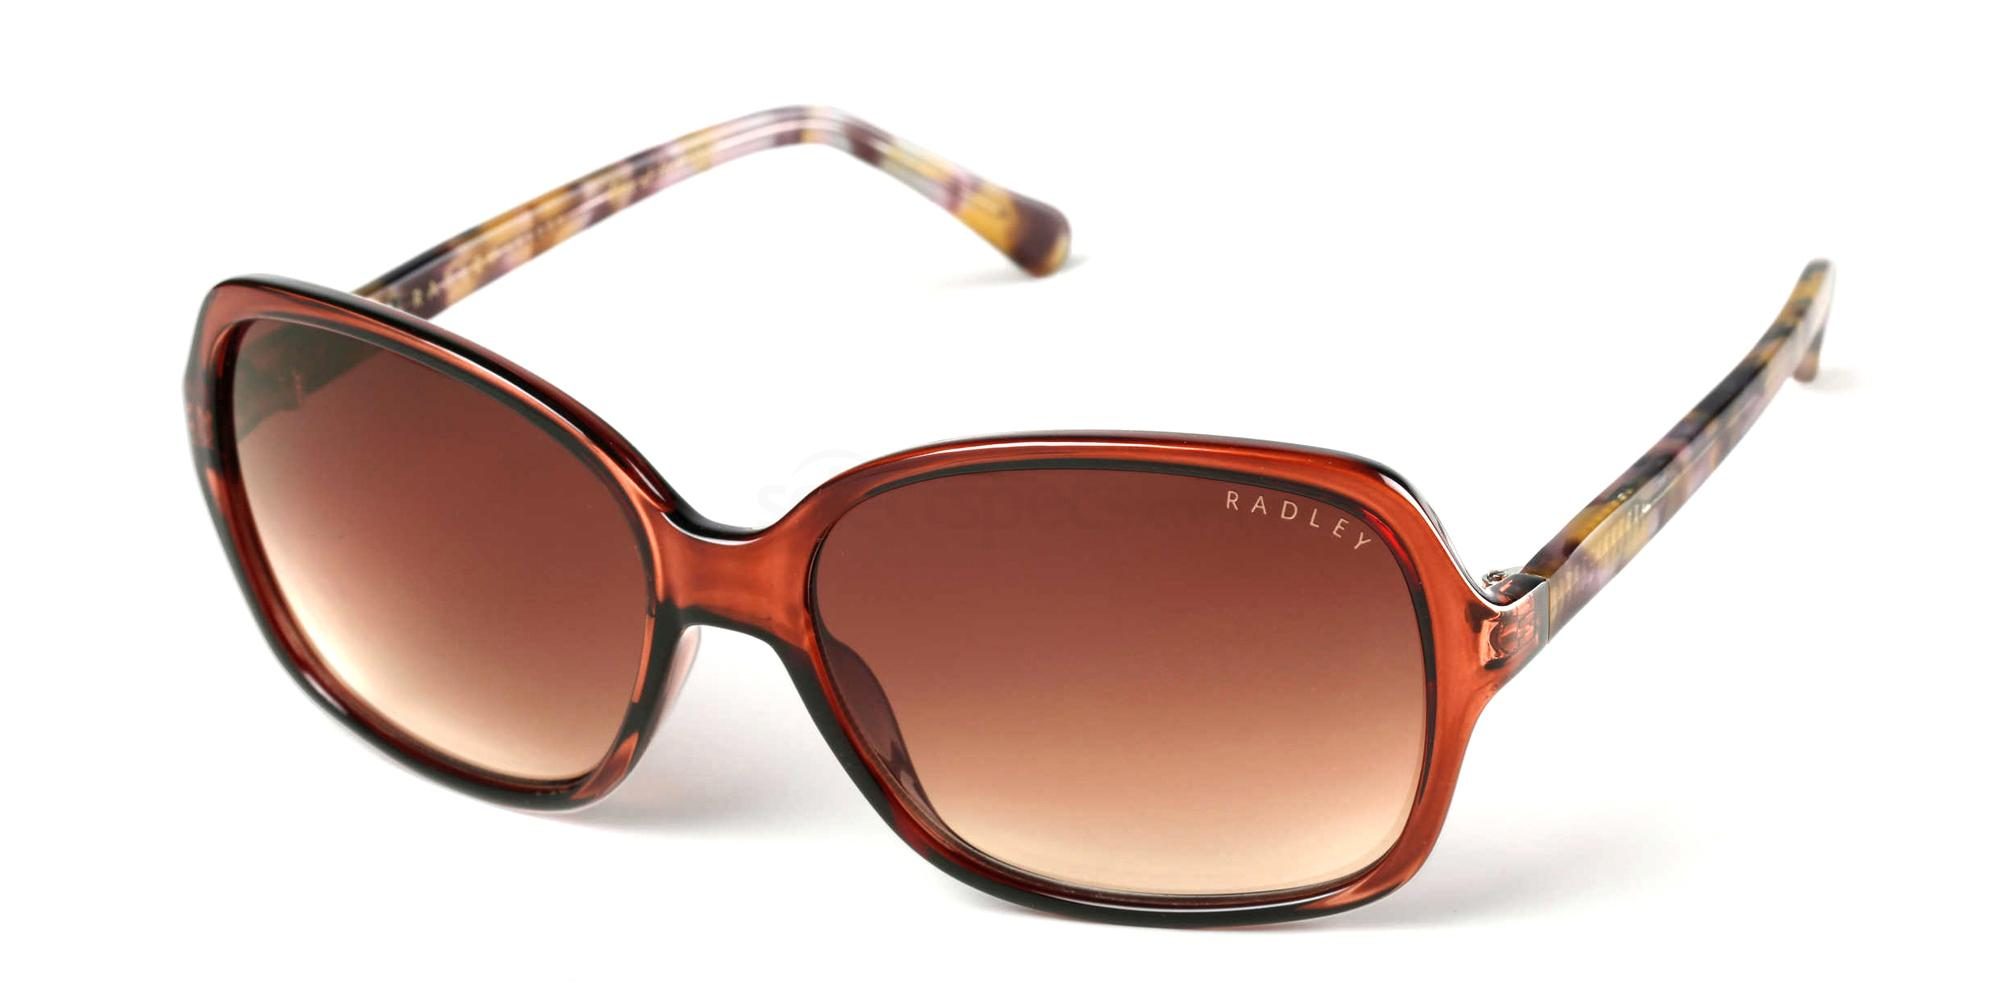 103 RDS-ABBIE Sunglasses, Radley London